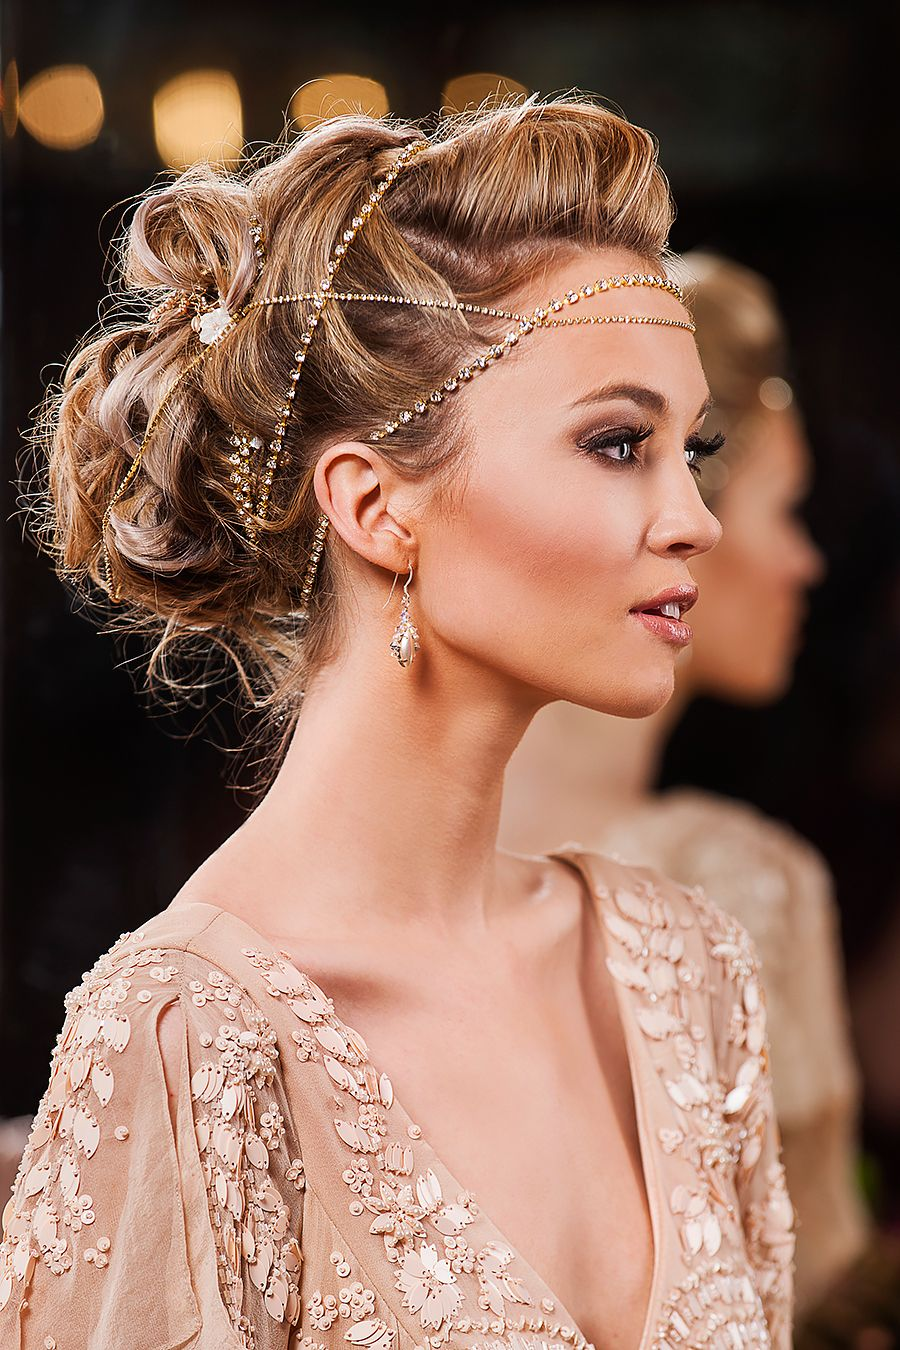 Luxury Wedding Accessories   Eleventh Heaven - StrictlyWeddings.com Blog